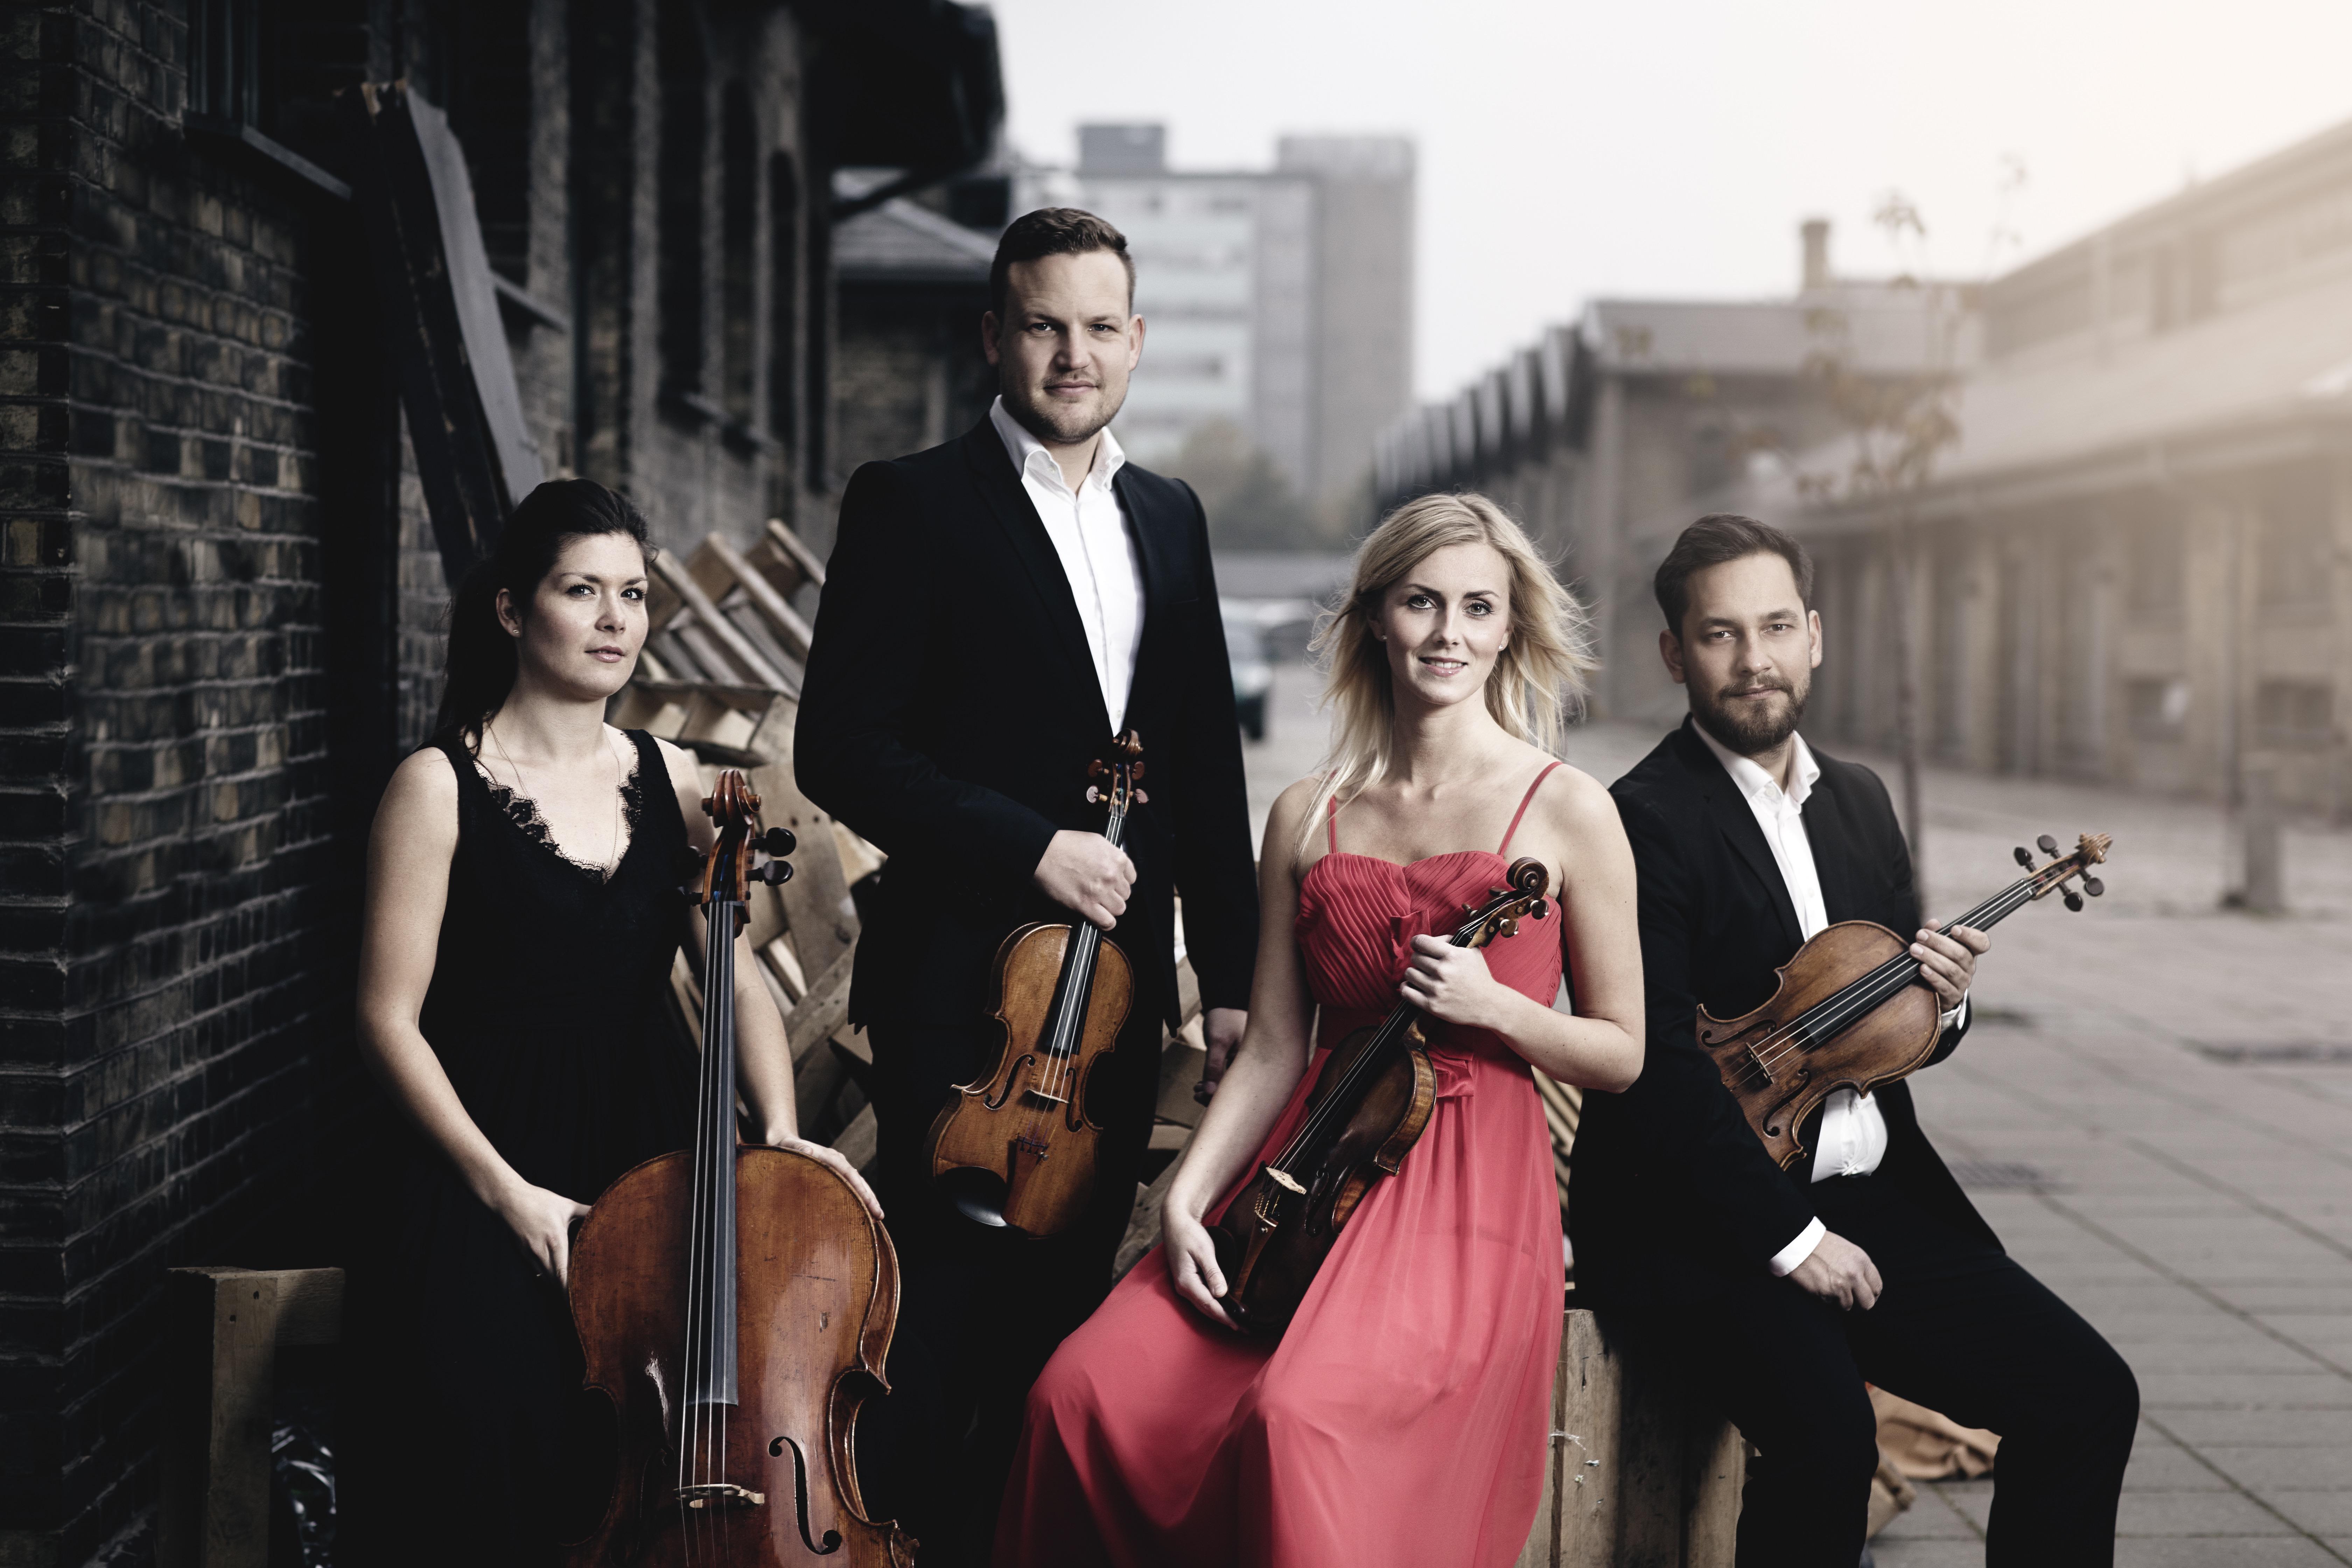 Nordic_string_quartet_small